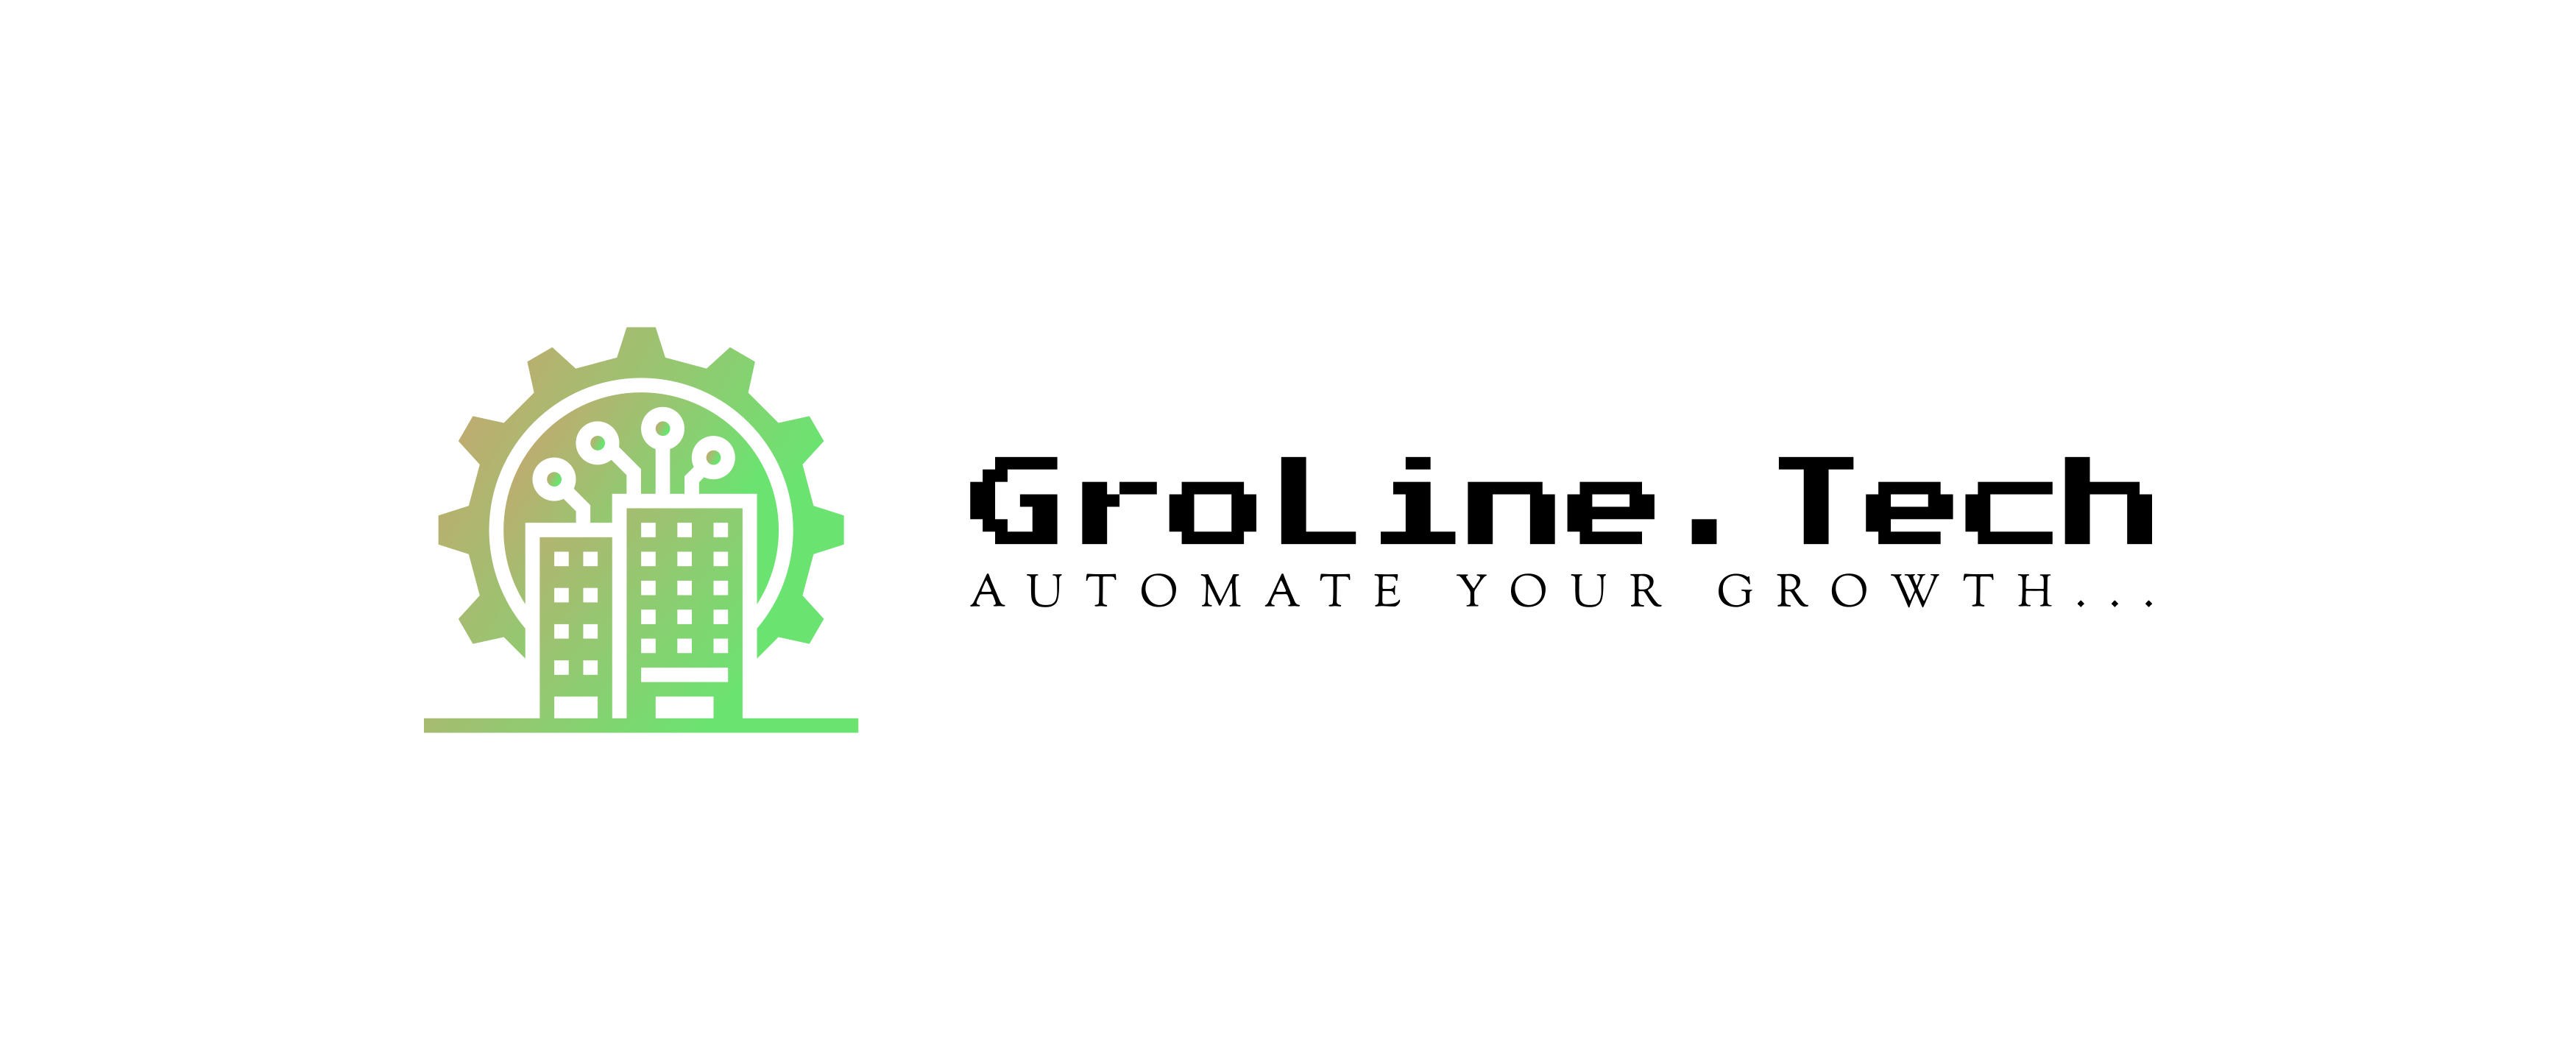 Gro-Line, Inc, a chatbot developer